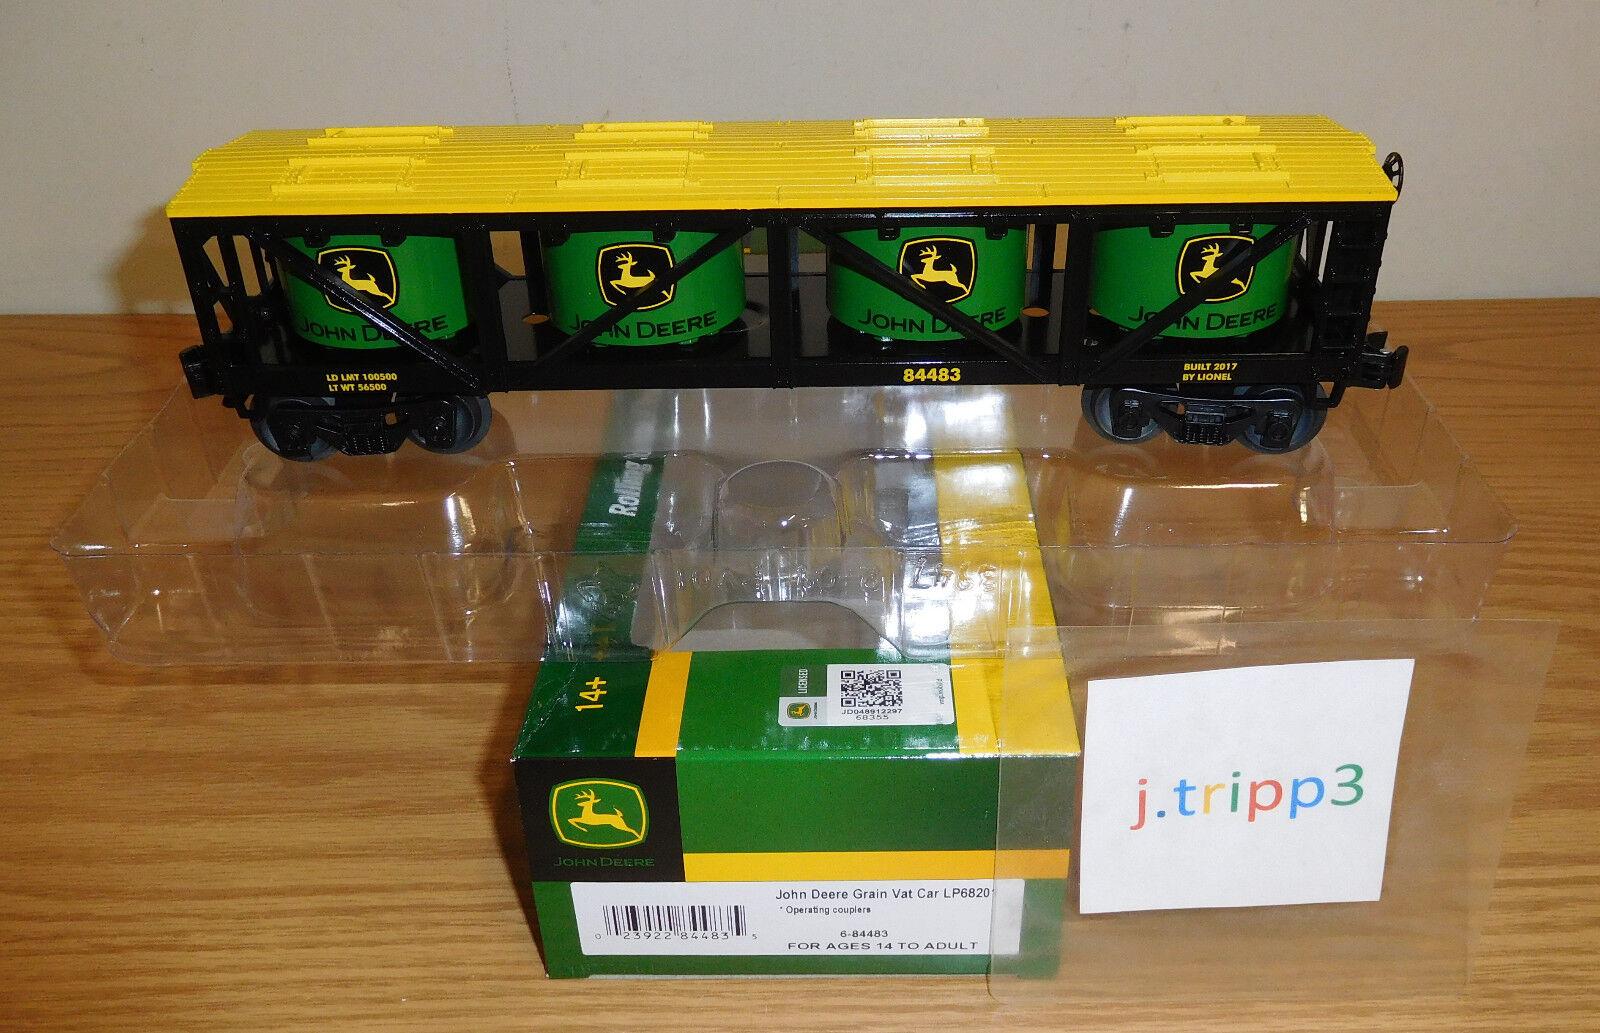 venta mundialmente famosa en línea Lionel 6-84483 John Deere Farm grano IVA Coche de Juguete Juguete Juguete Tren o calibre del ferroCocheril de Cochega  clásico atemporal